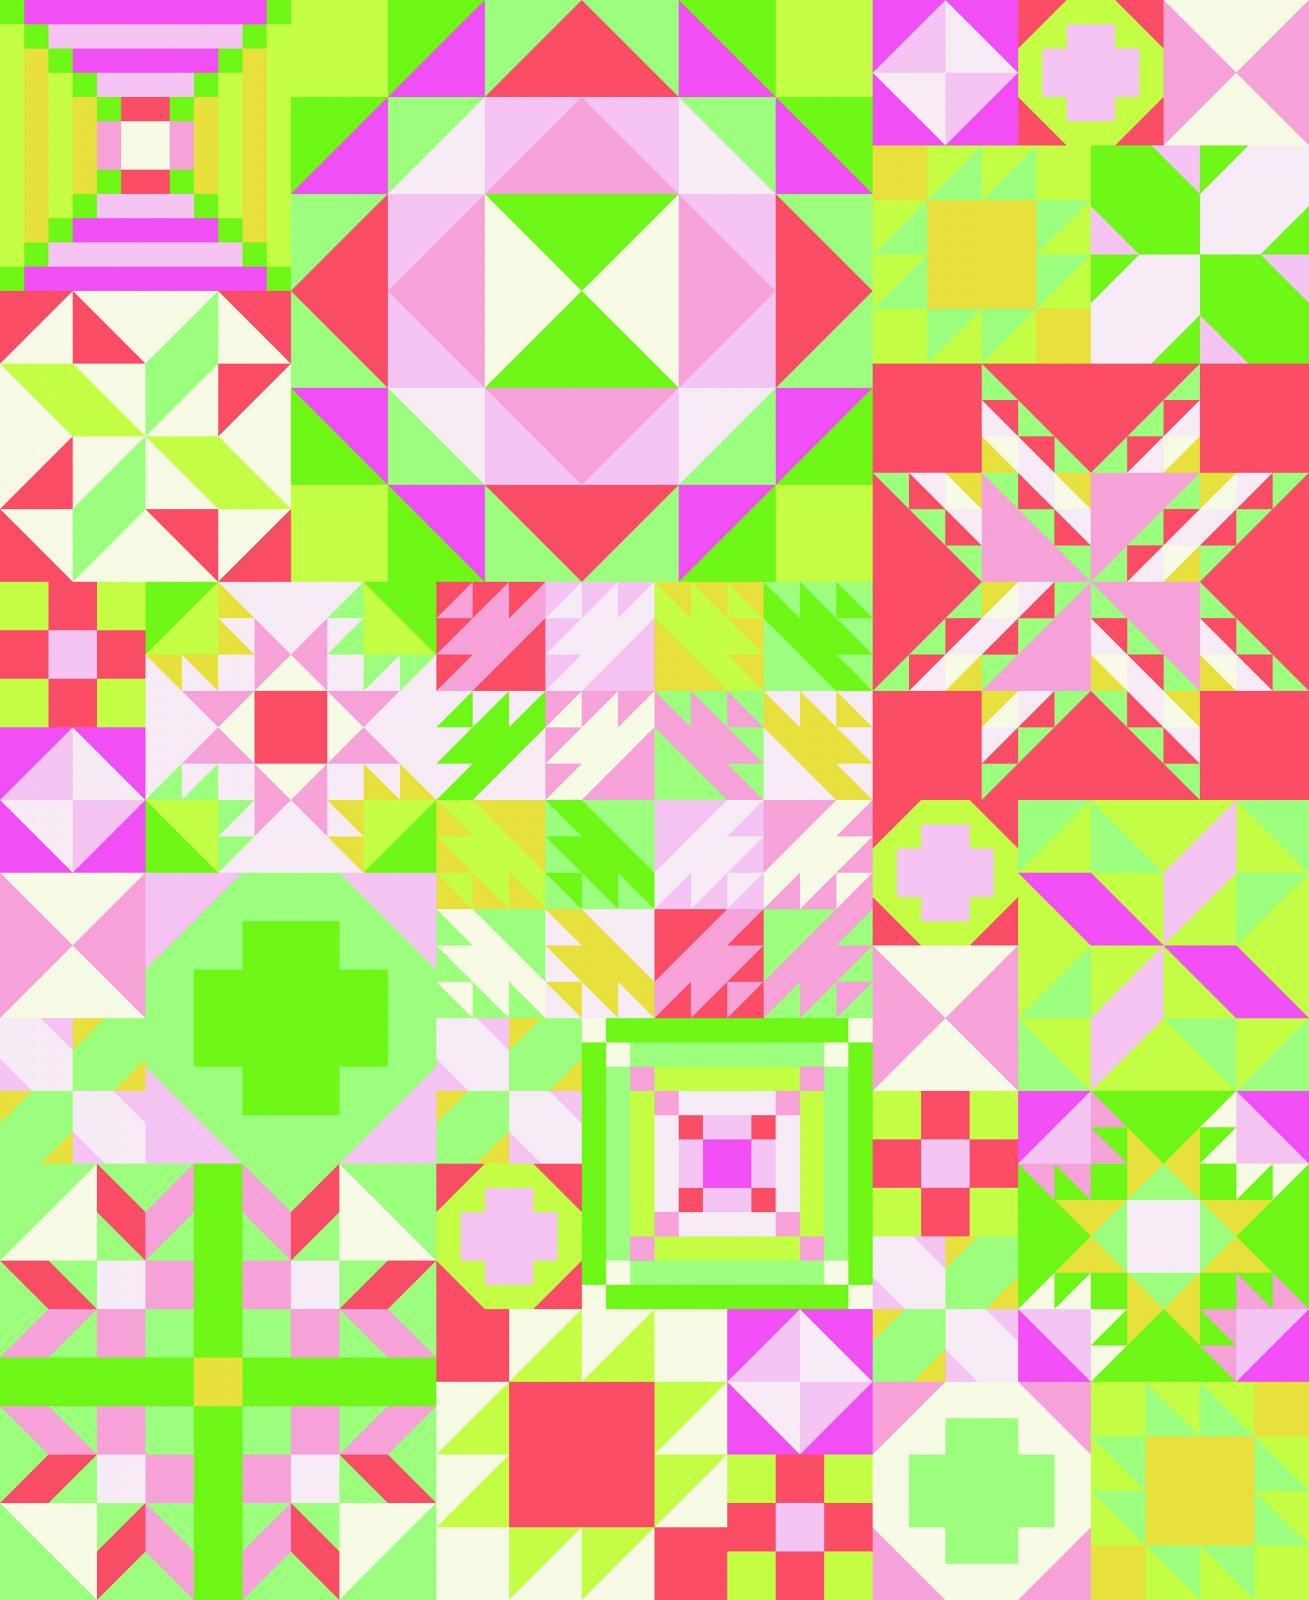 My Favorite Color is Moda Primrose Garden Sampler Quilt Kit